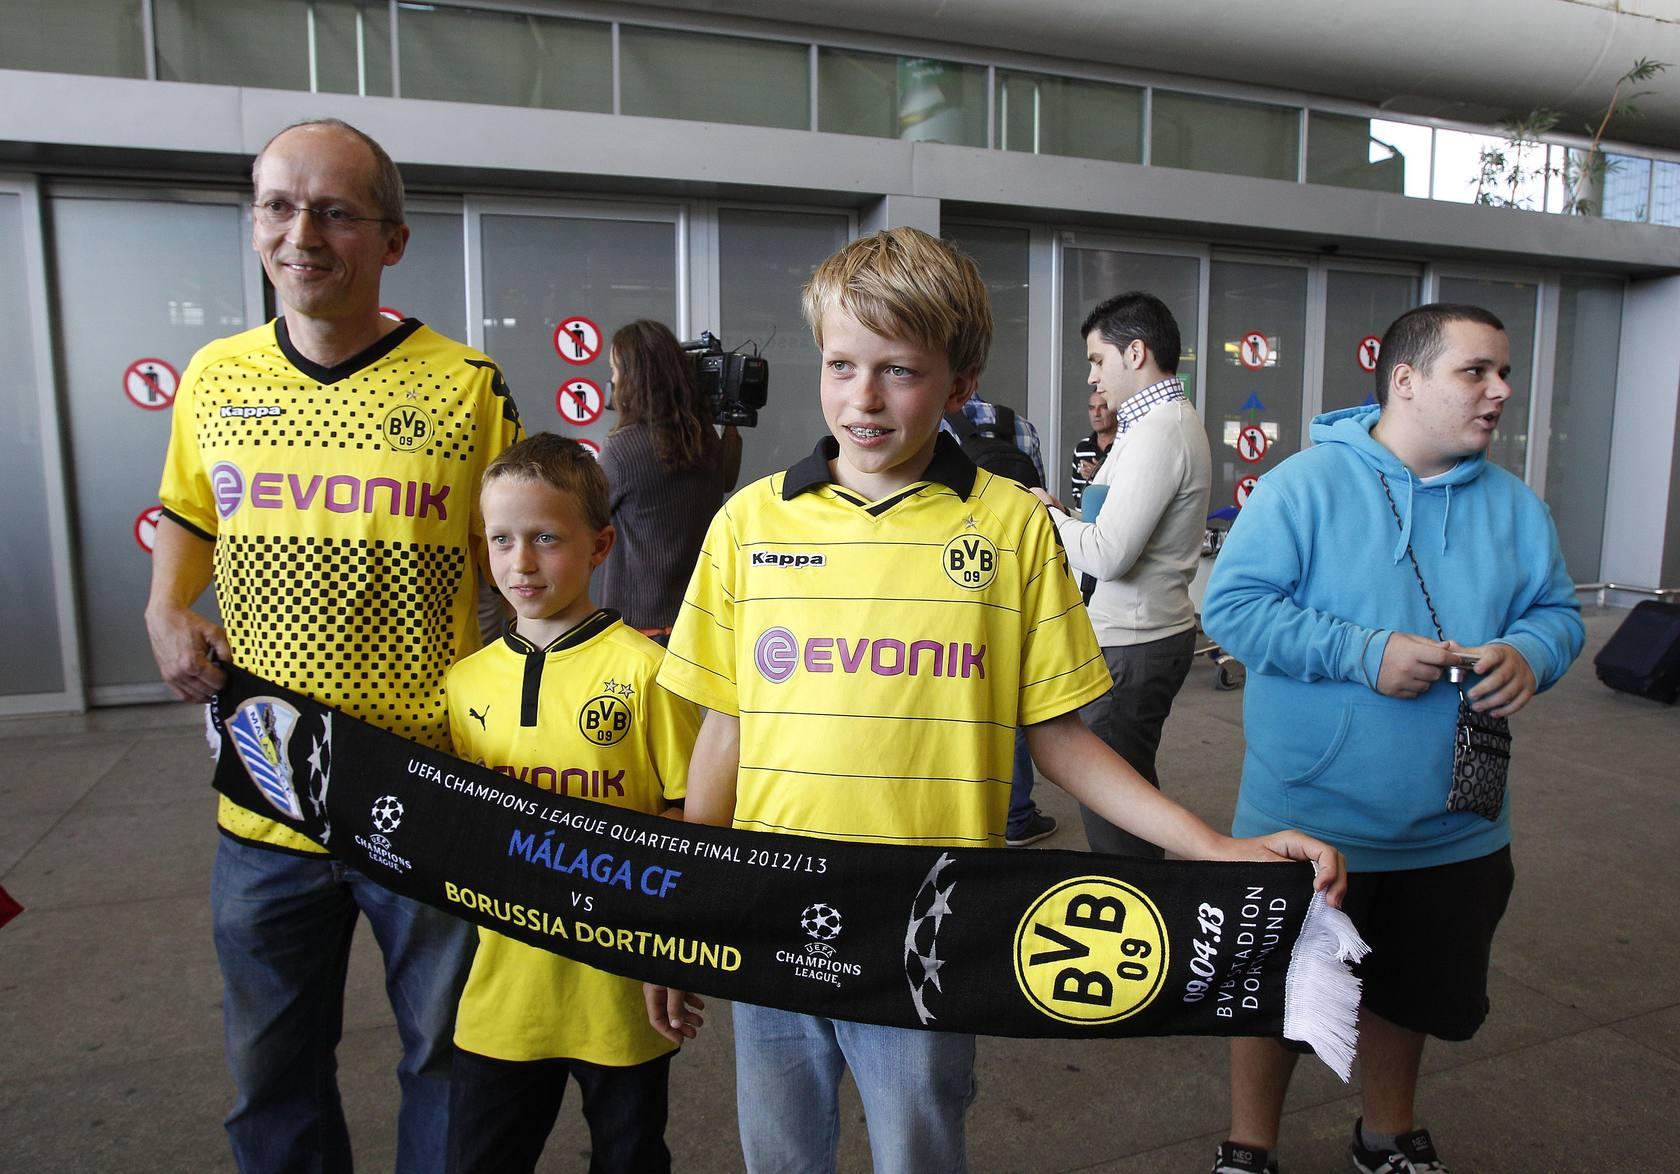 El Borussia Dortmund llega a Málaga para el partido de Champions